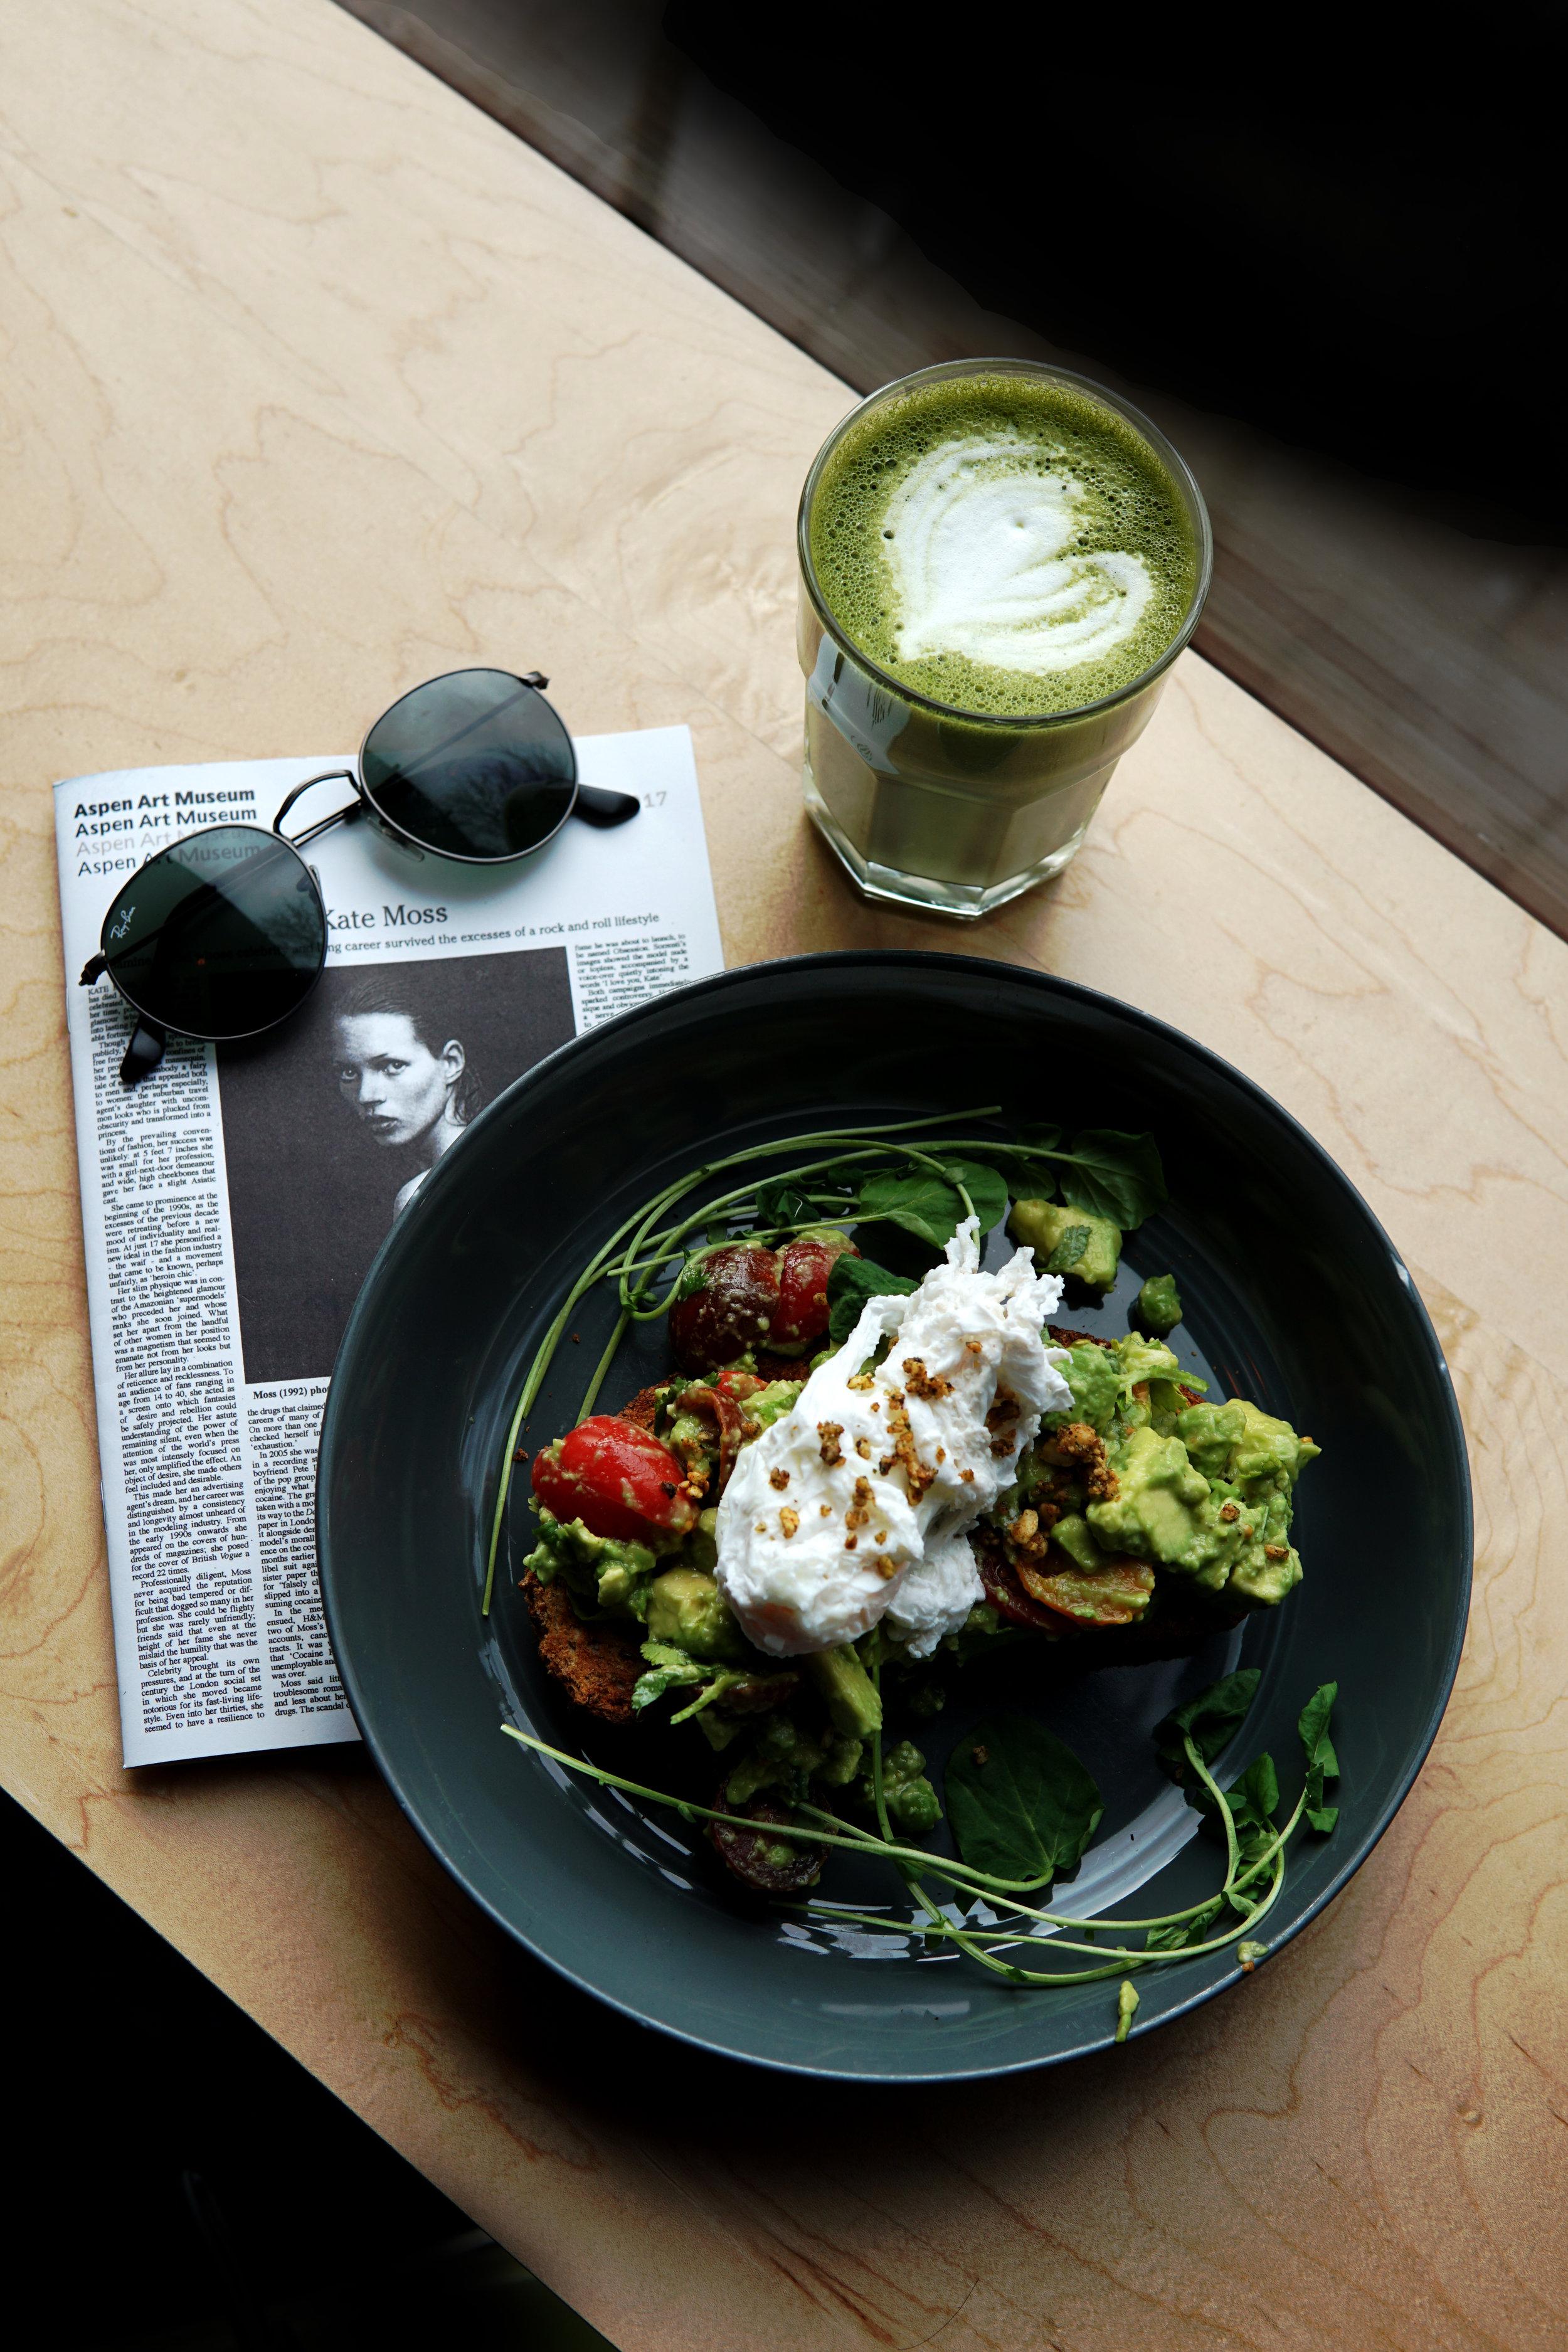 Breakfast and Matcha at Victoria's Espresso Bar